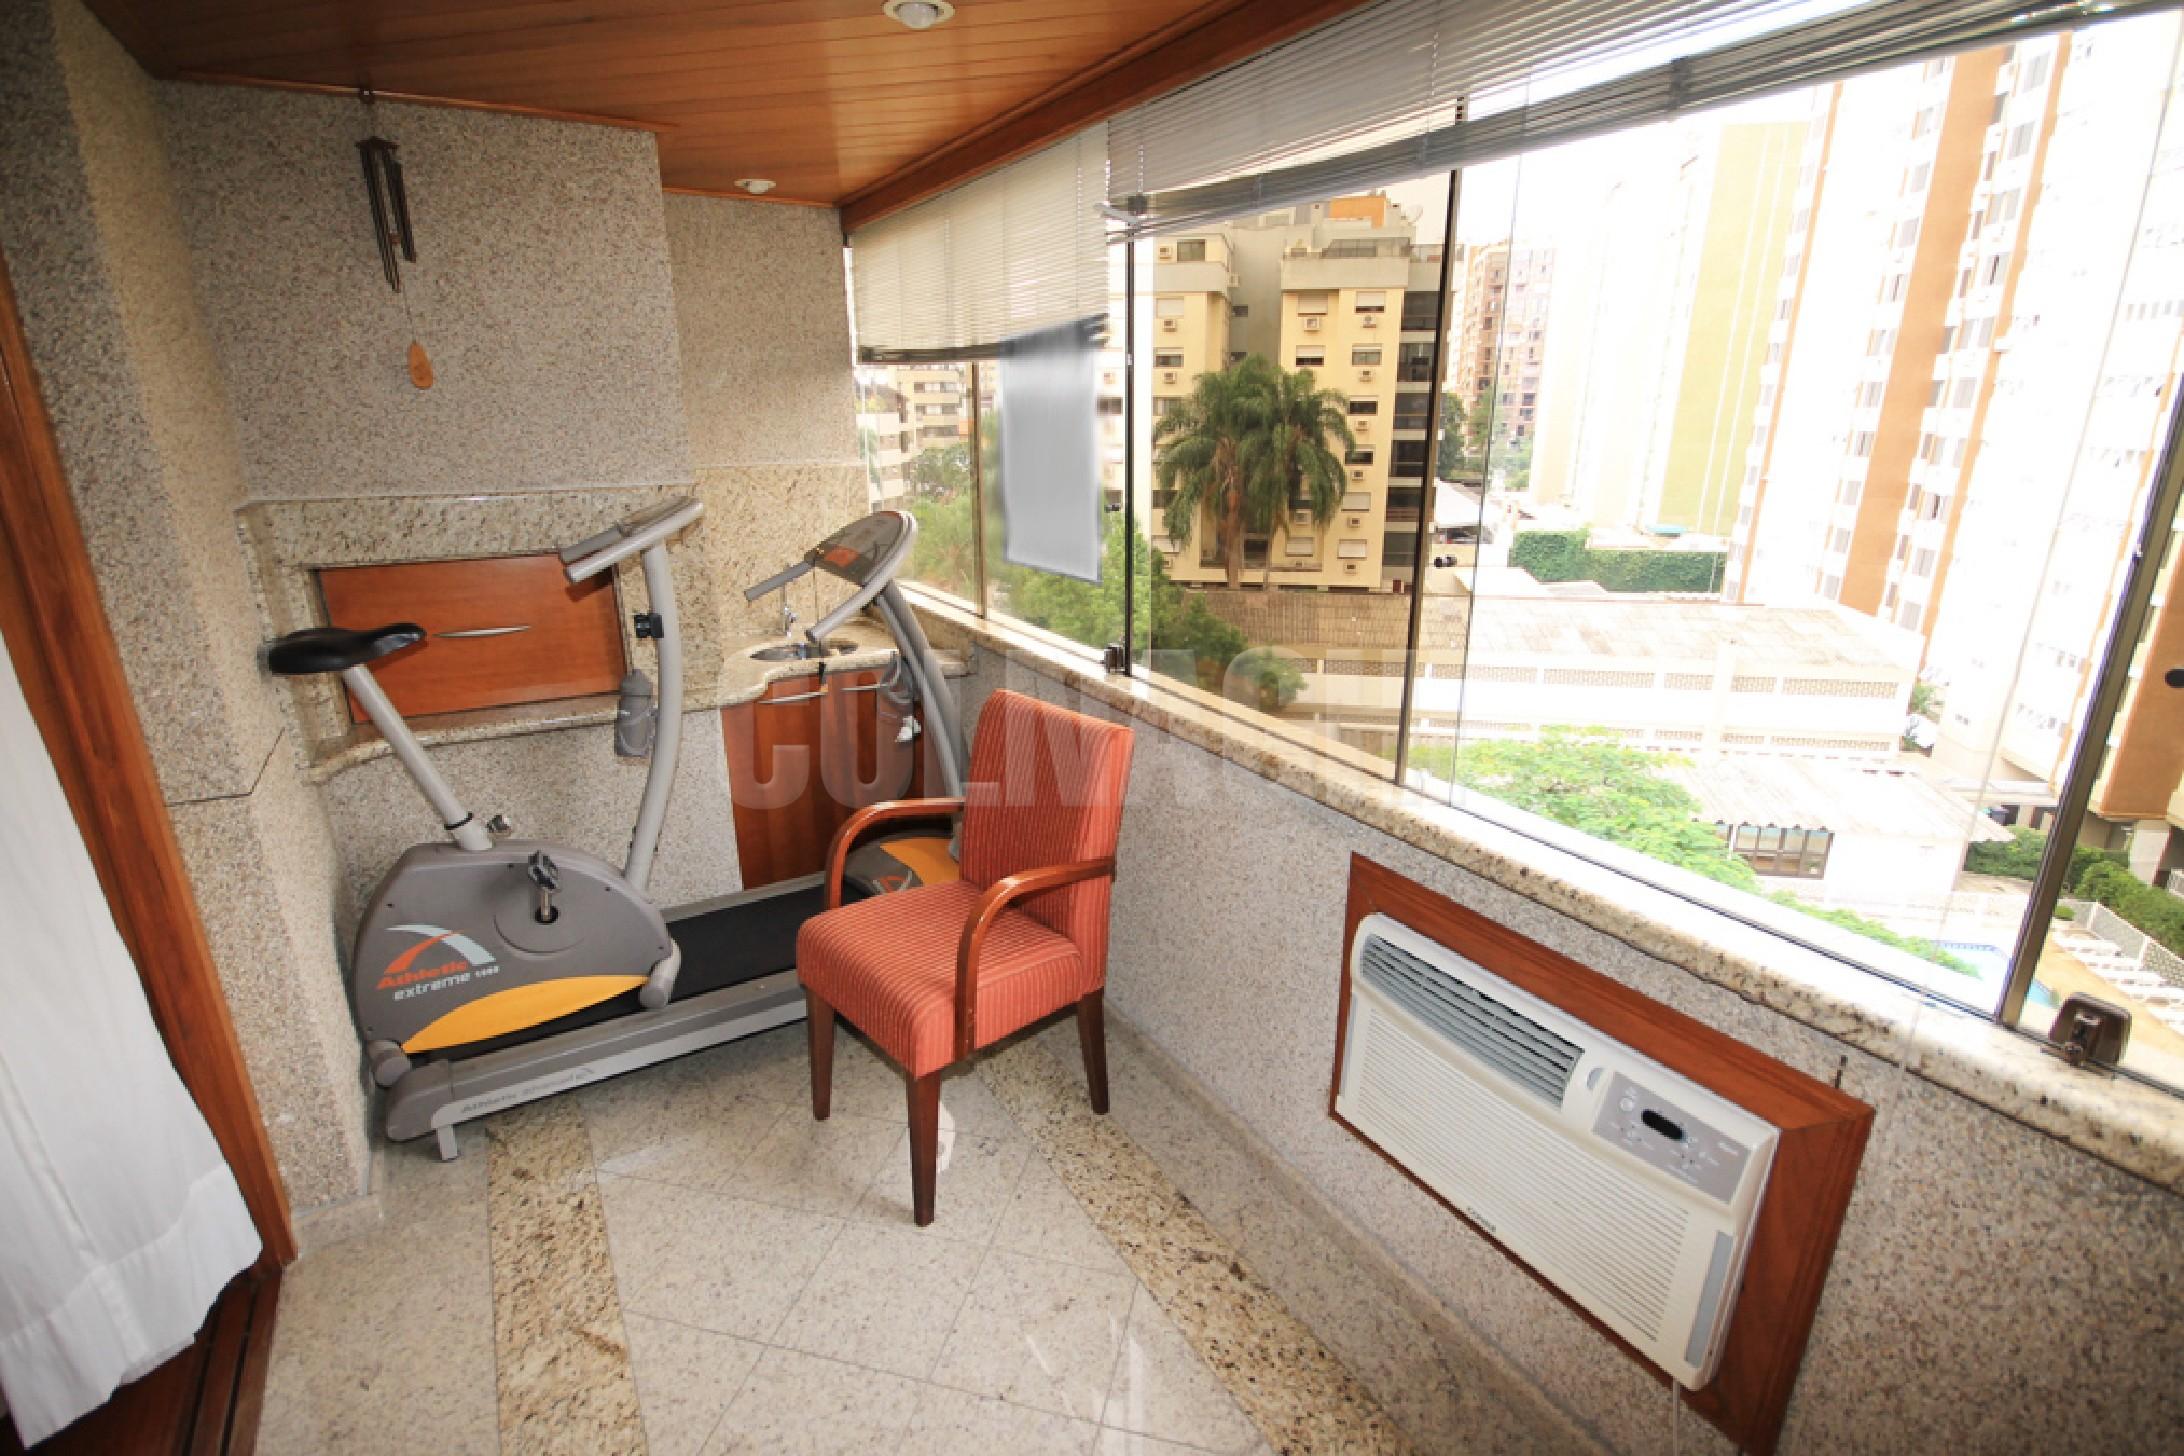 Edificio Vila Di Capri - Apto 3 Dorm, Bela Vista, Porto Alegre - Foto 4